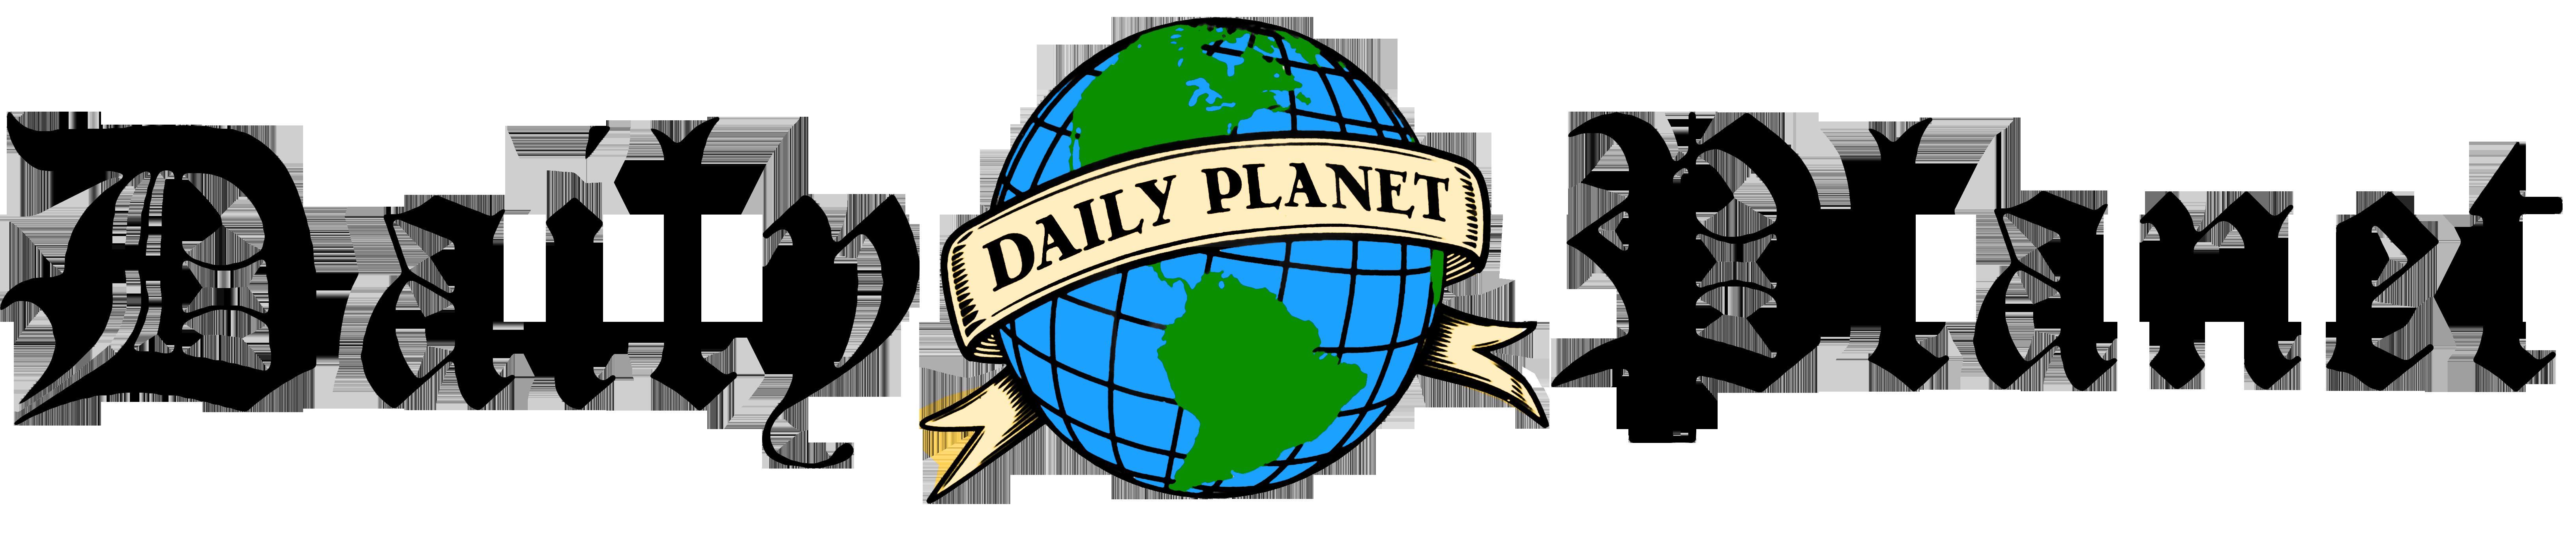 daily planet logo www pixshark com images galleries superman logo template customizable superman logo template customize